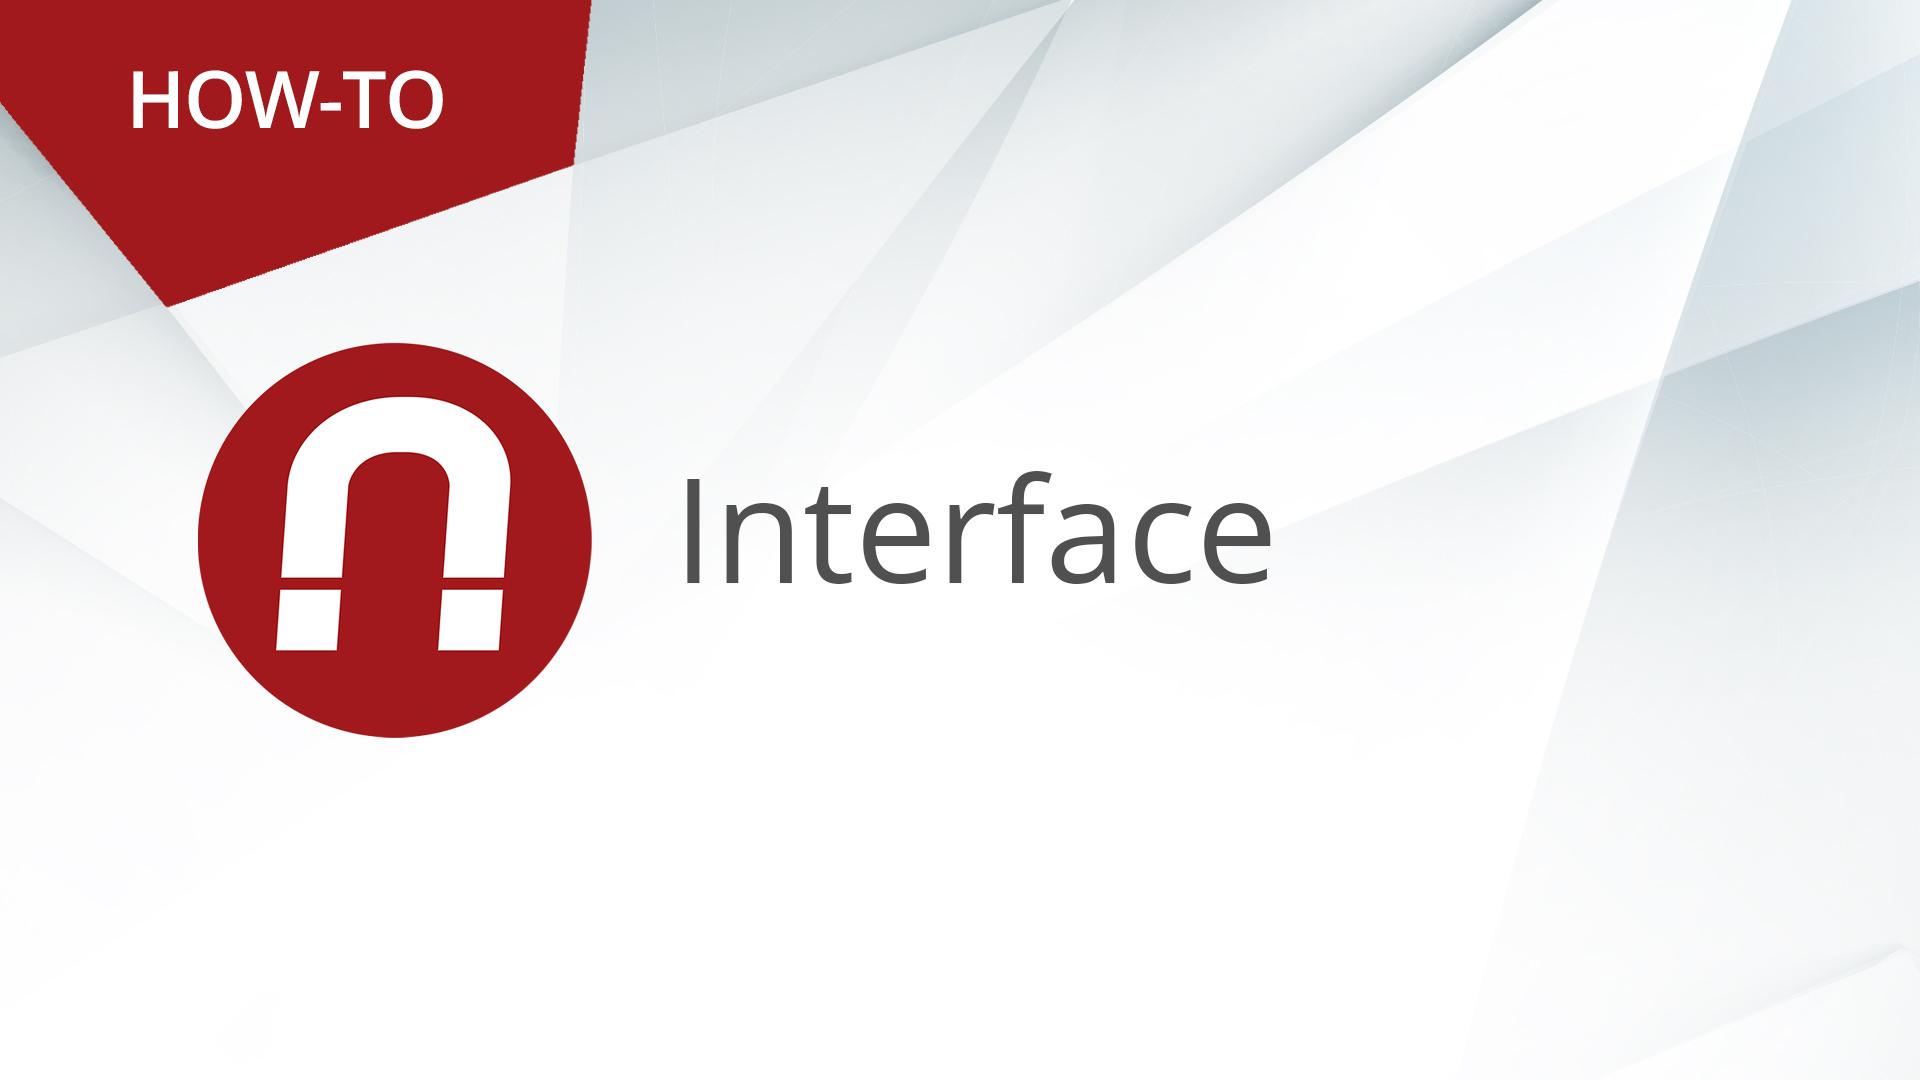 How-To: AMAGNO Basics – The Interface